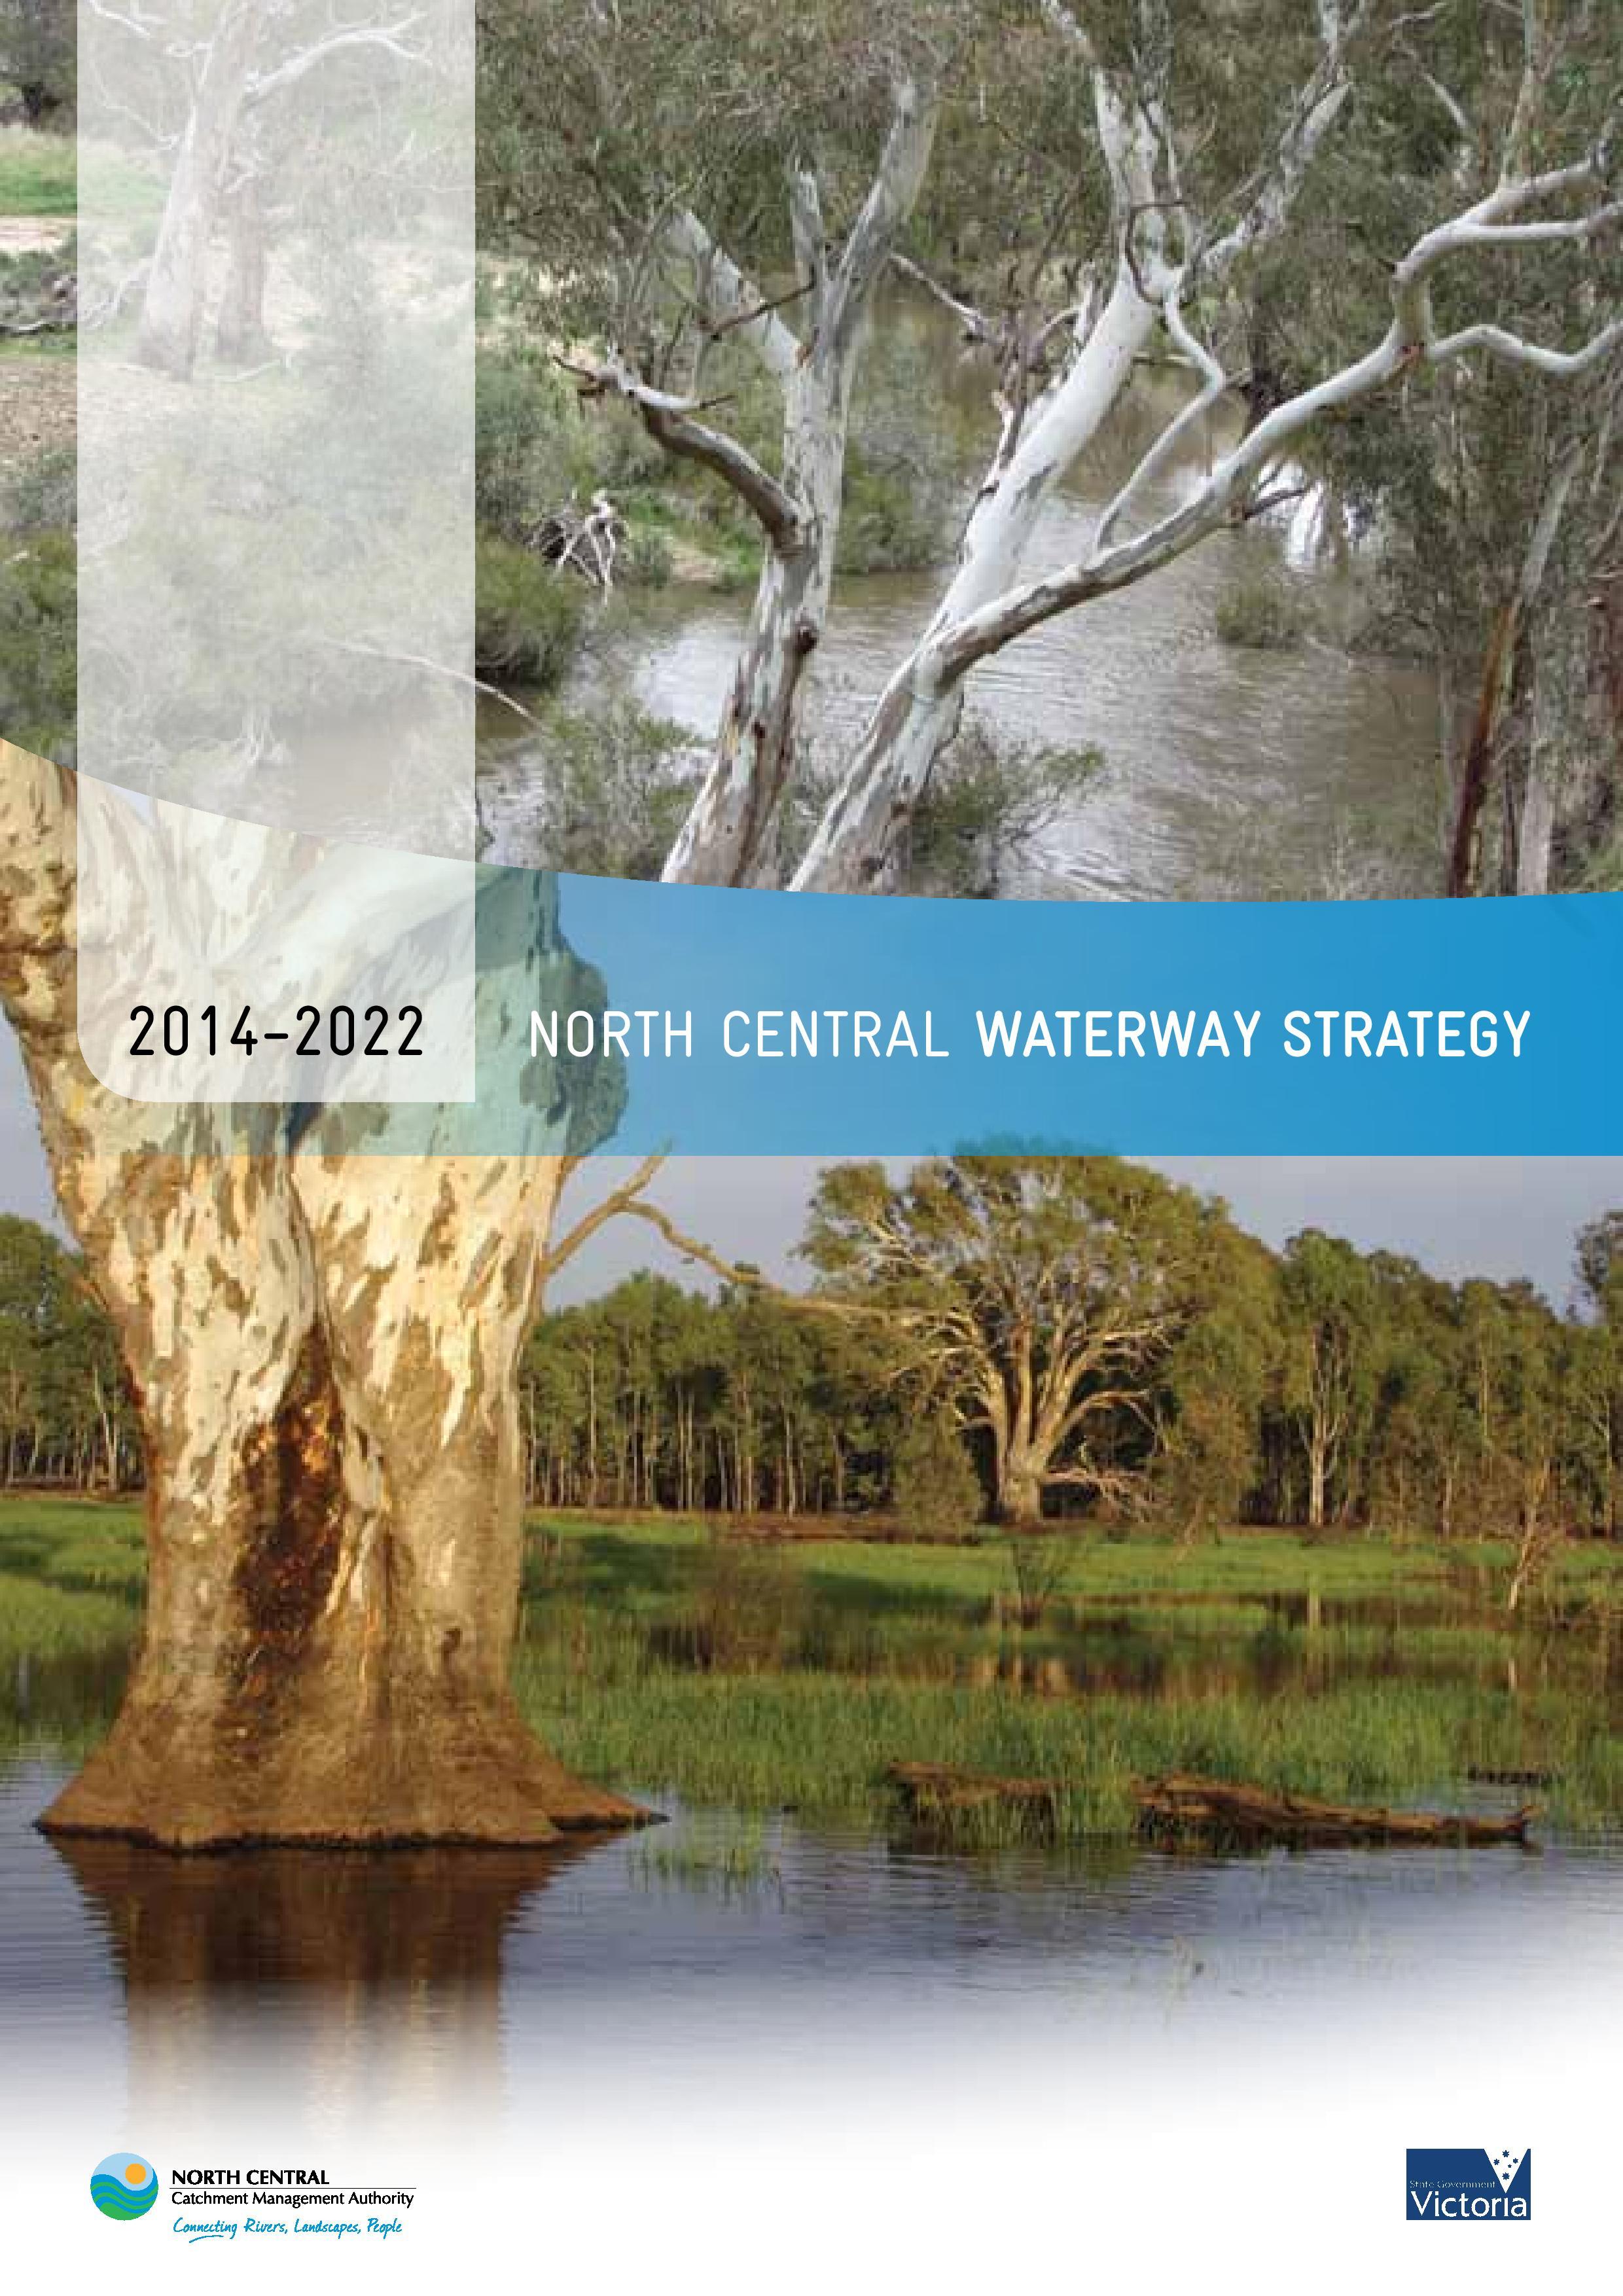 North_Central_Waterway_Strategy_2014-2022.jpg